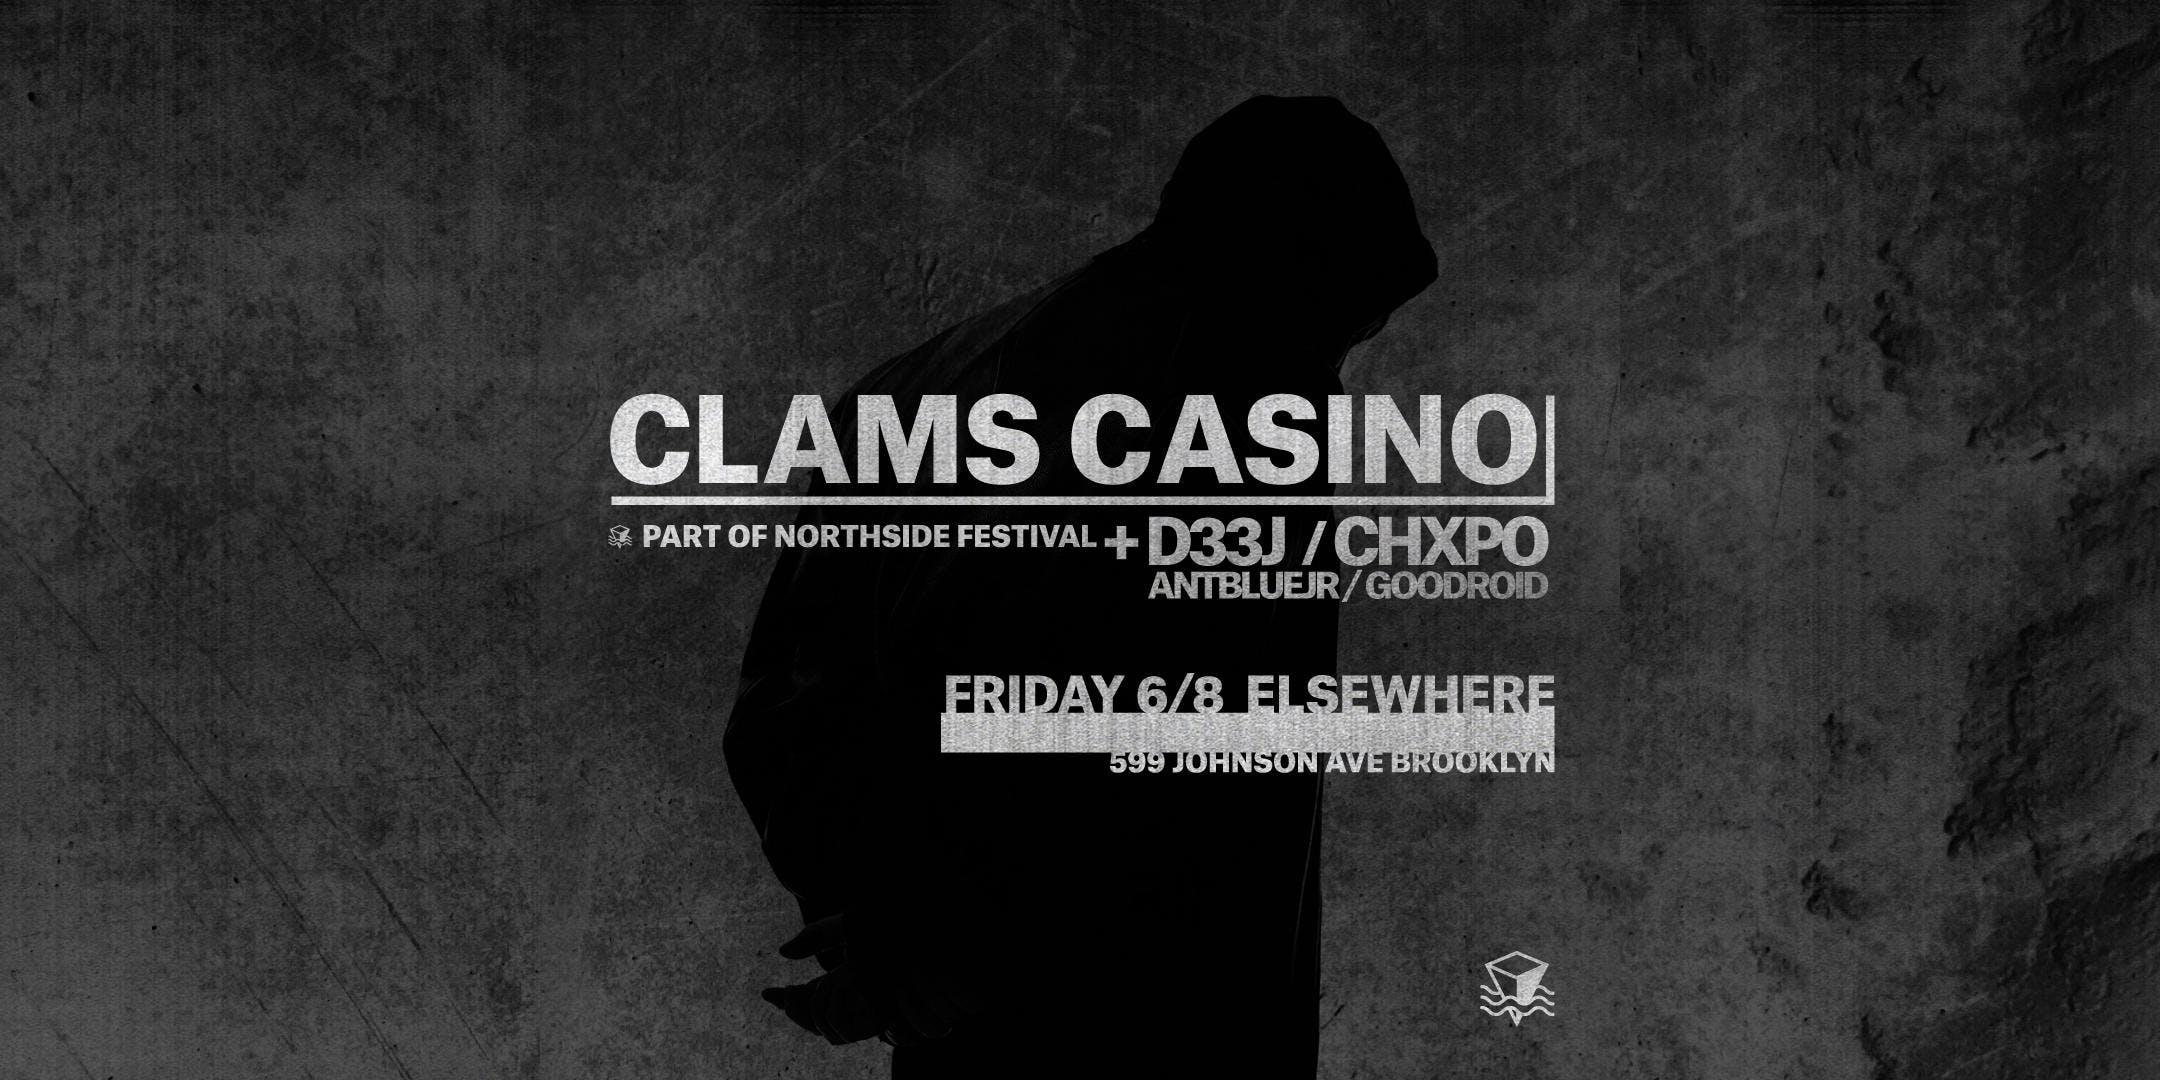 Clams Casino, D33J, CHXPO, antbluejr, gooddroid